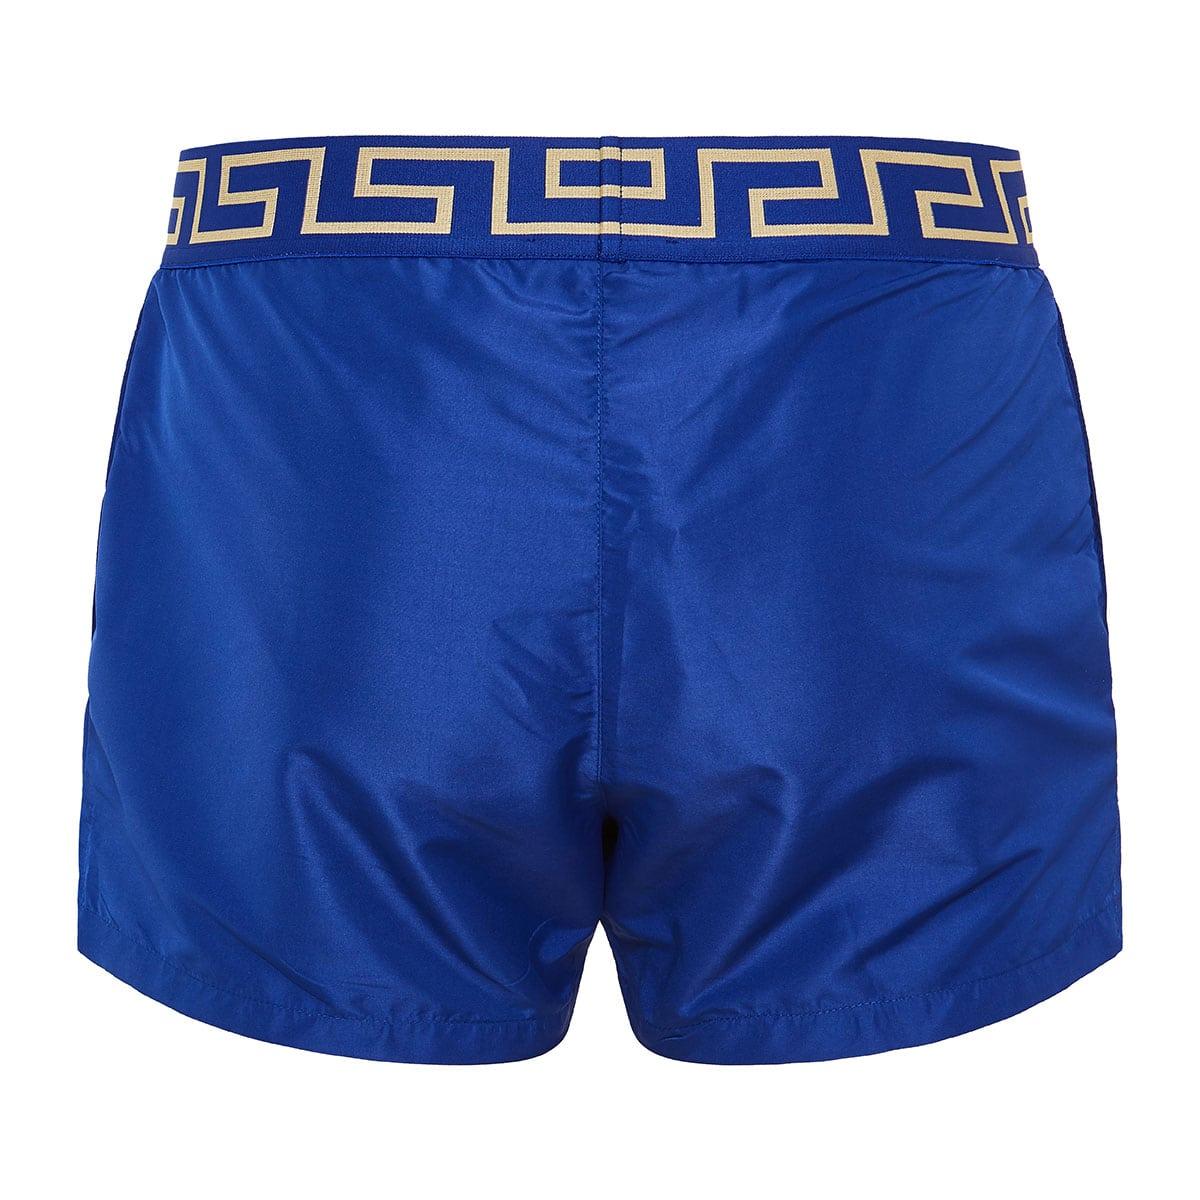 Greca print swim shorts